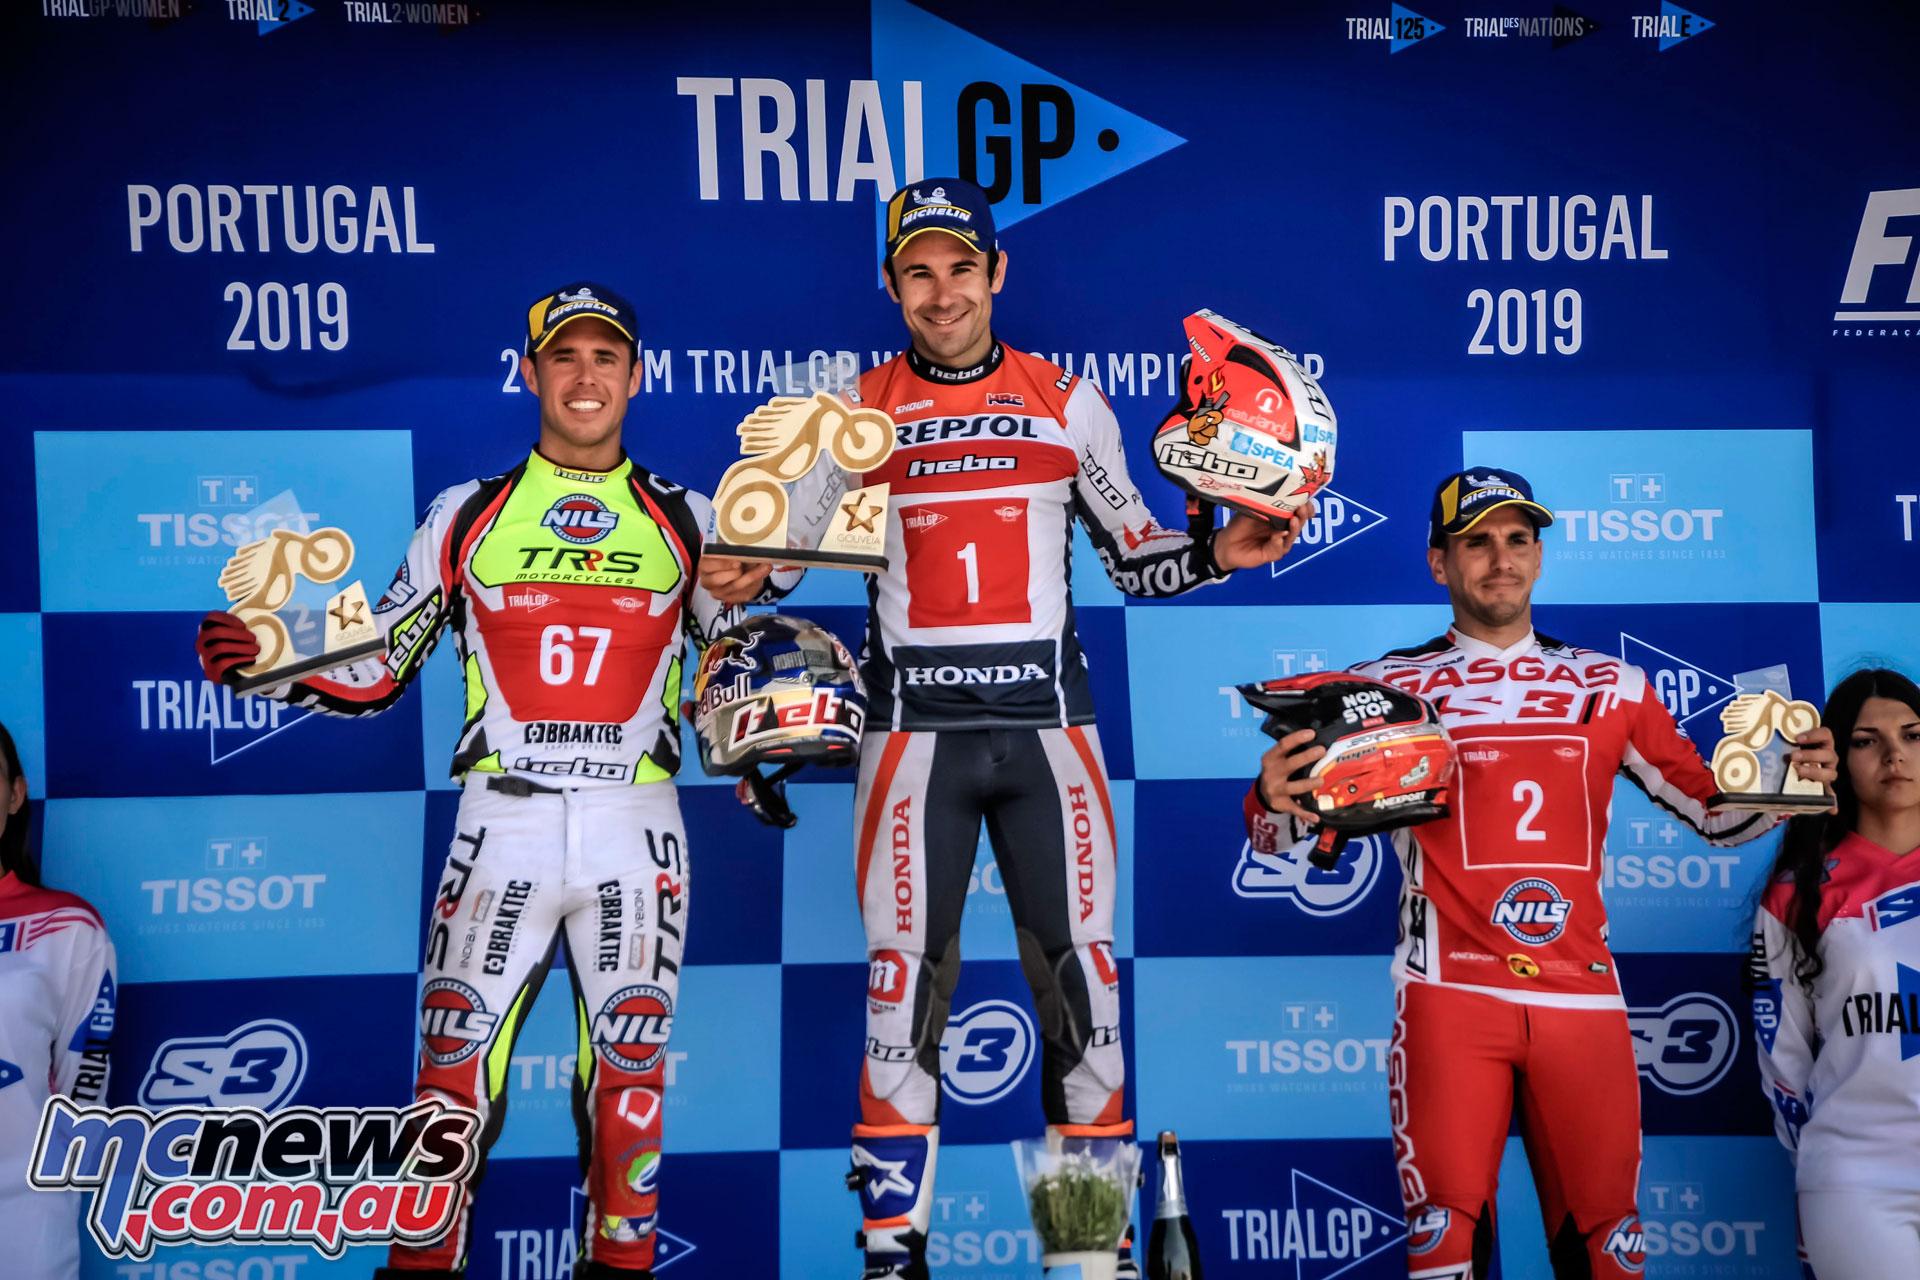 TrialGP Rnd Portugal podium ps